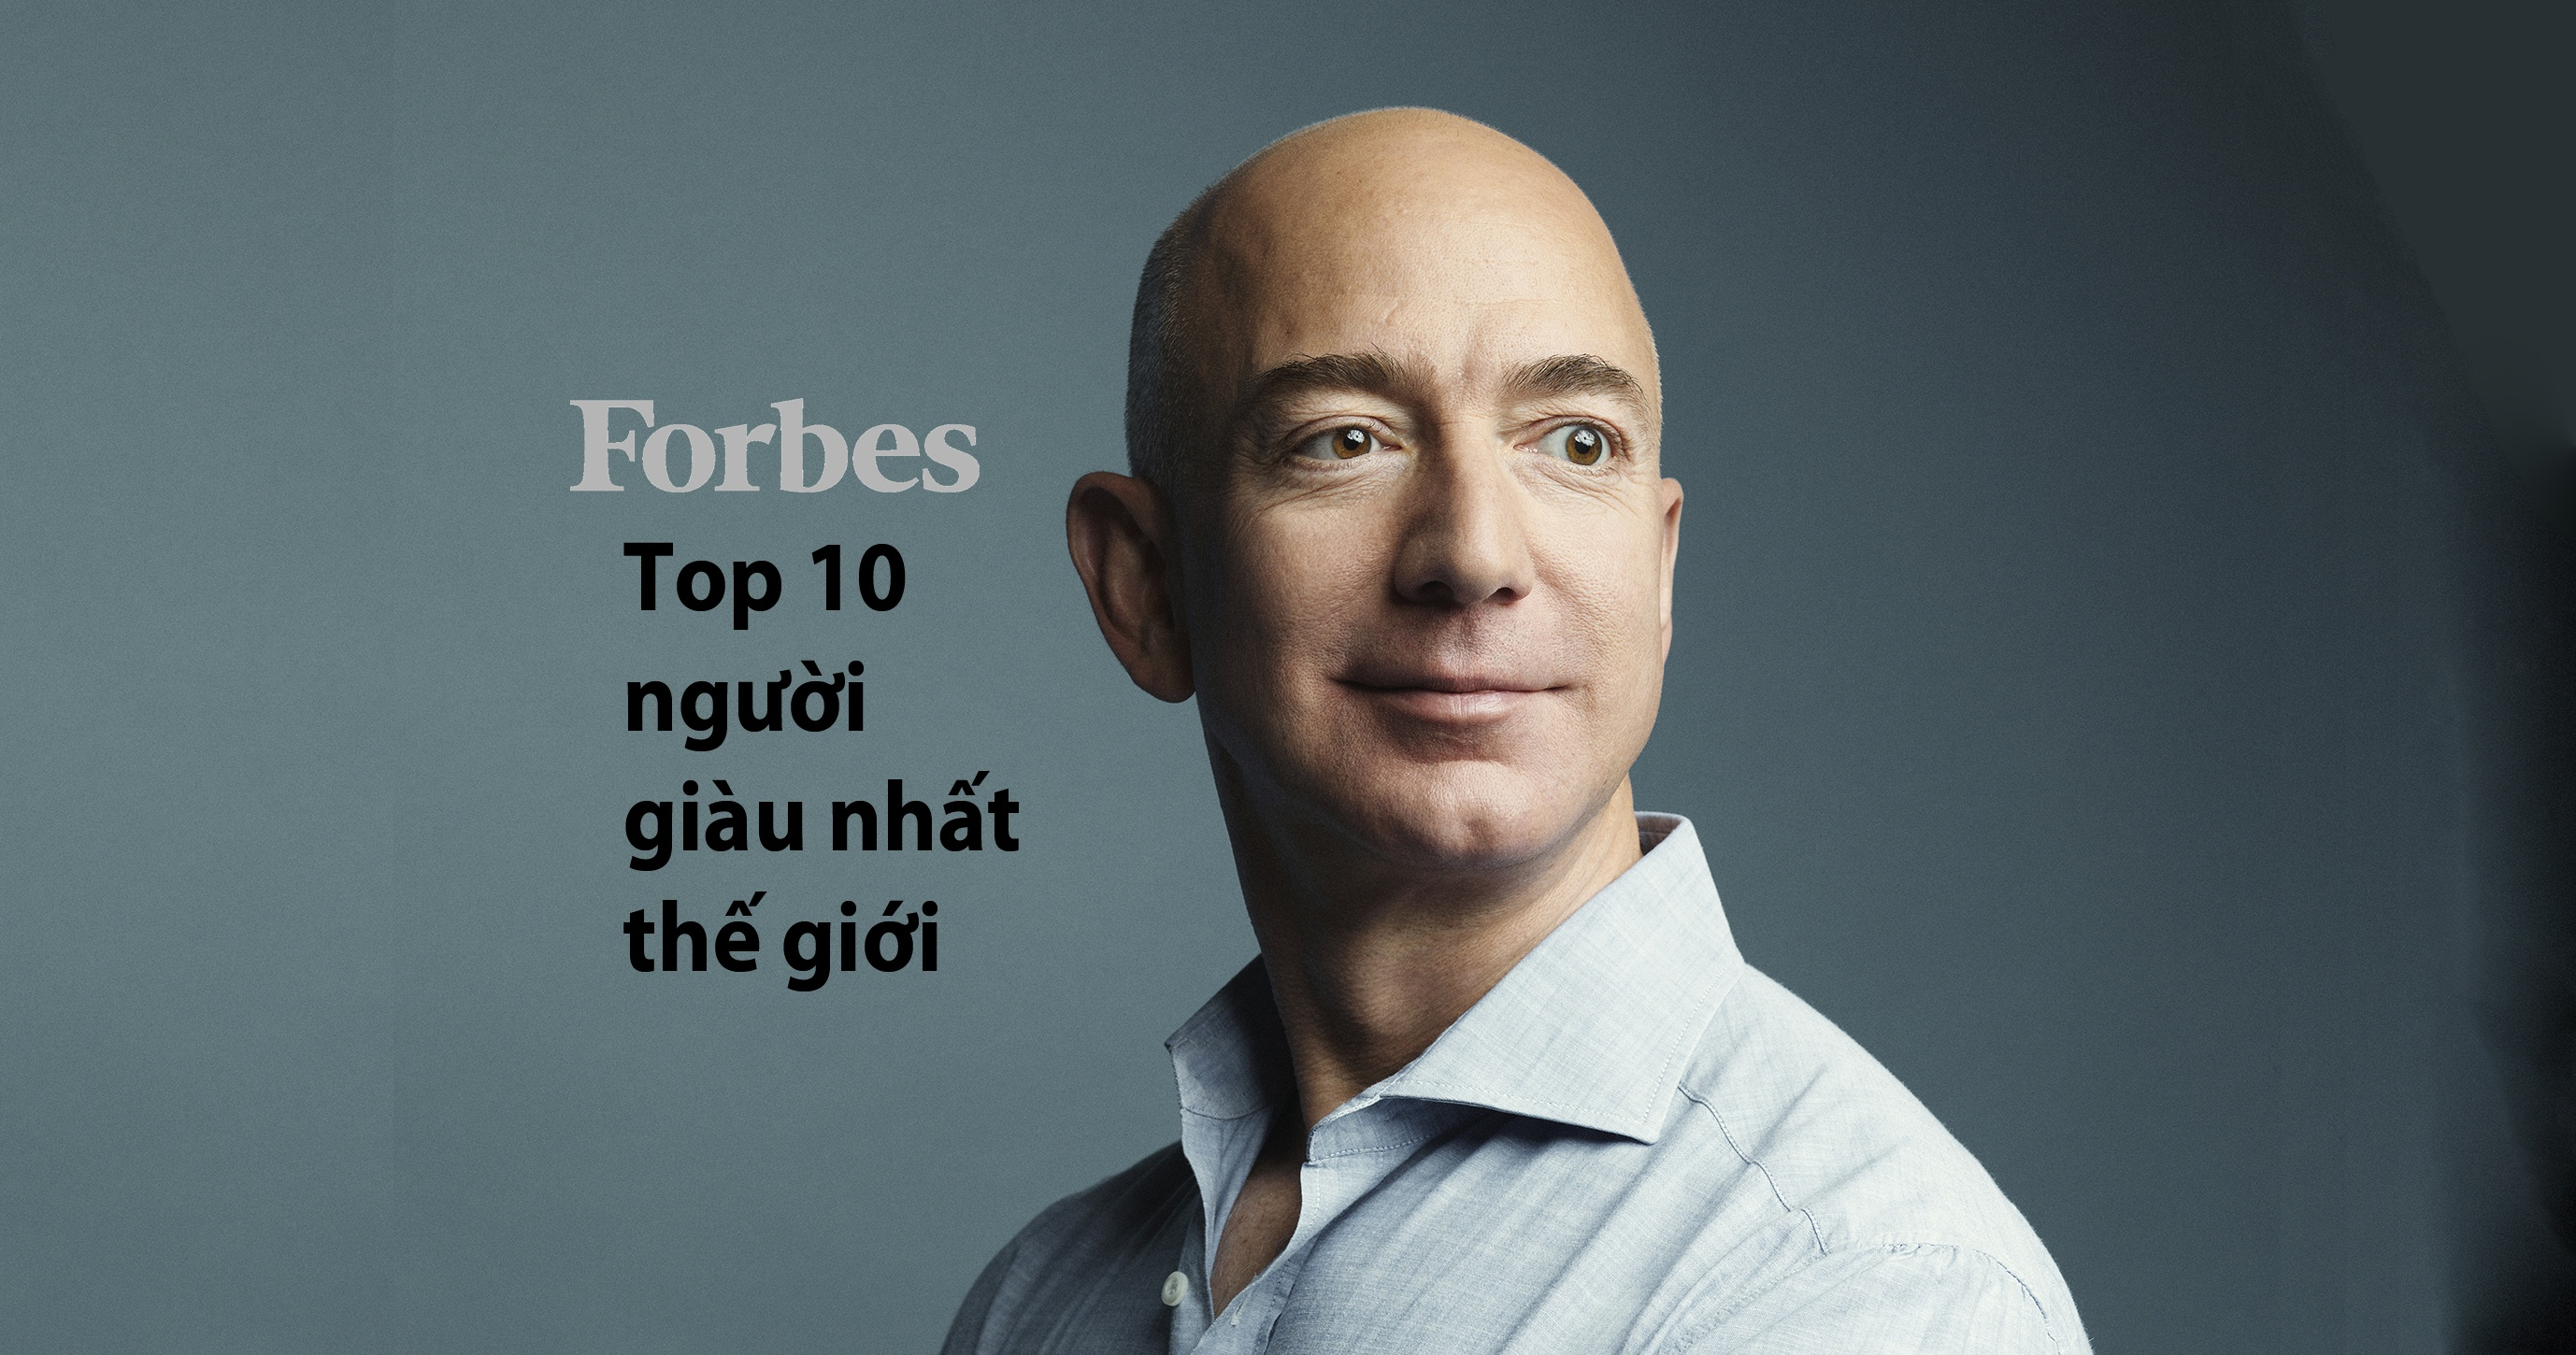 Top 10 ty phu giau nhat the gioi vua duoc Forbes vinh danh hinh anh 1